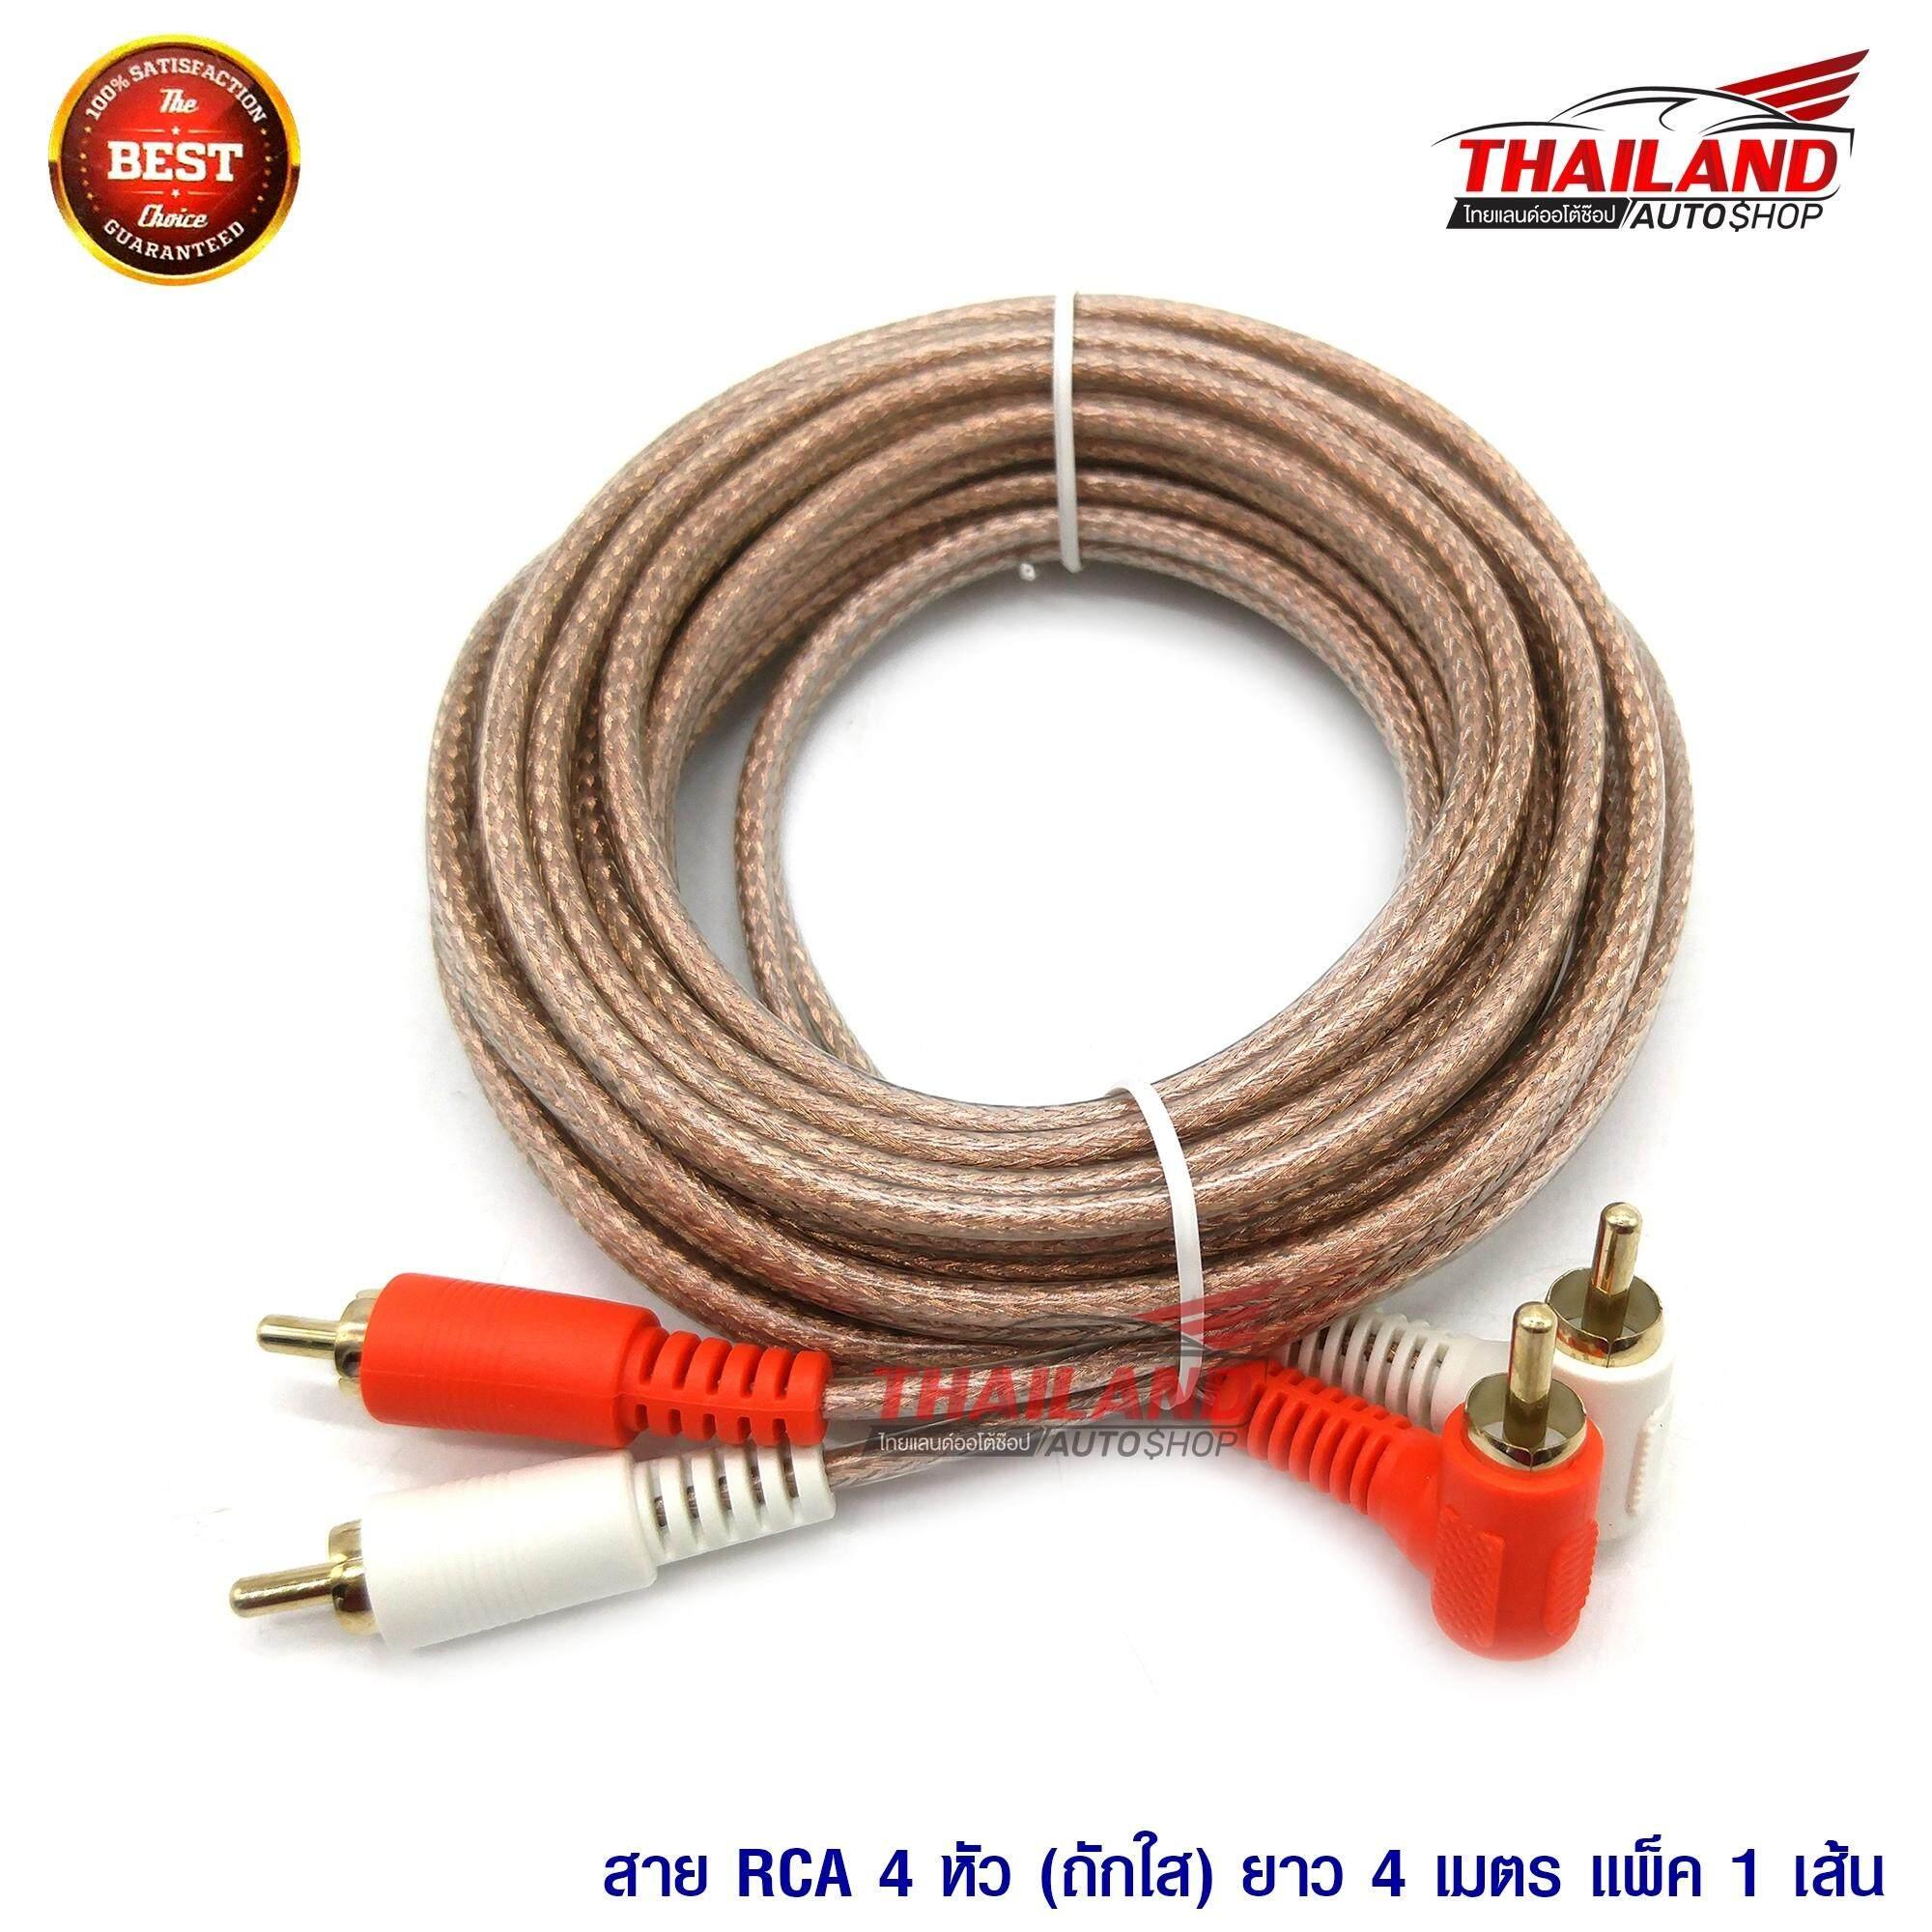 Thailand สาย Rca 4 หัว (ถักใส) 4 เมตร แพ็ค 1เส้น